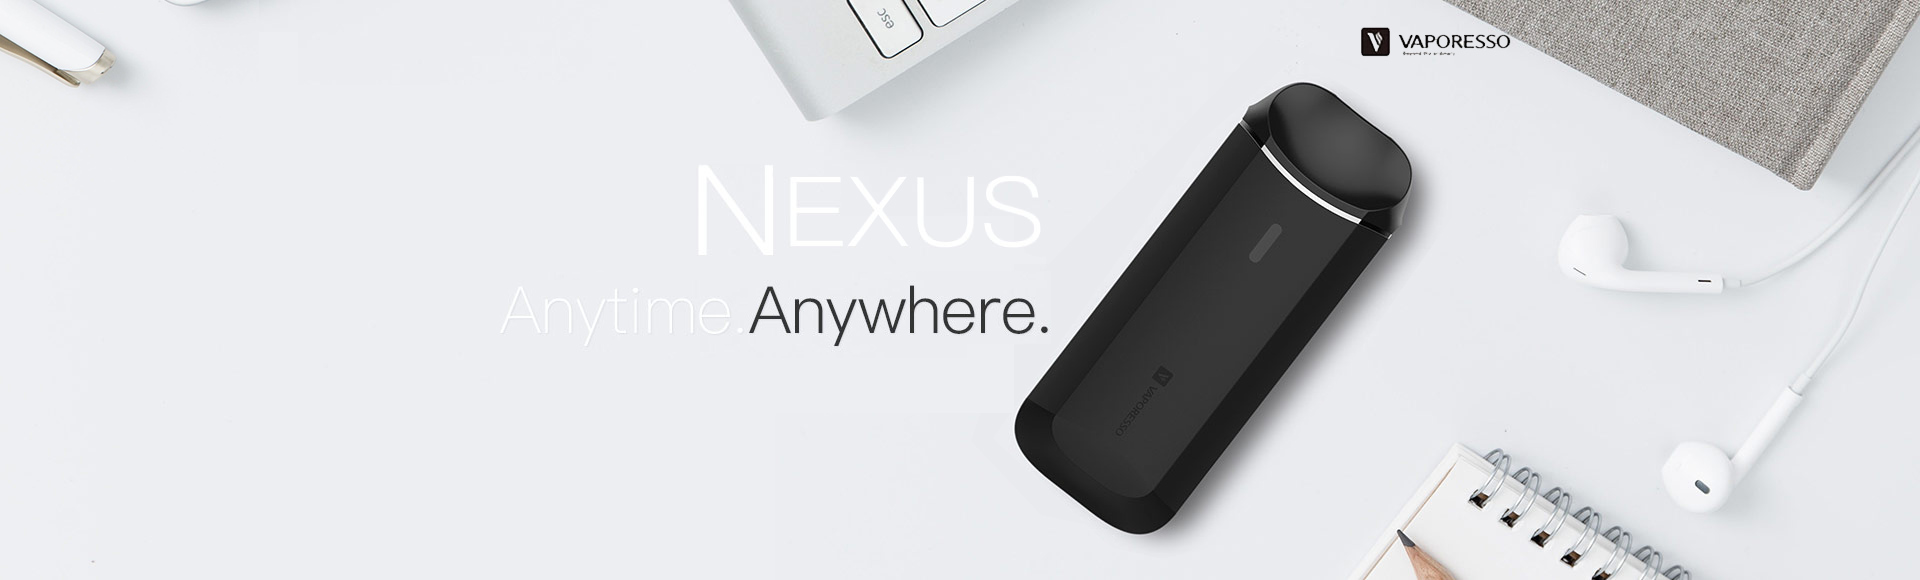 Vaporesso Nexus Starter Kit